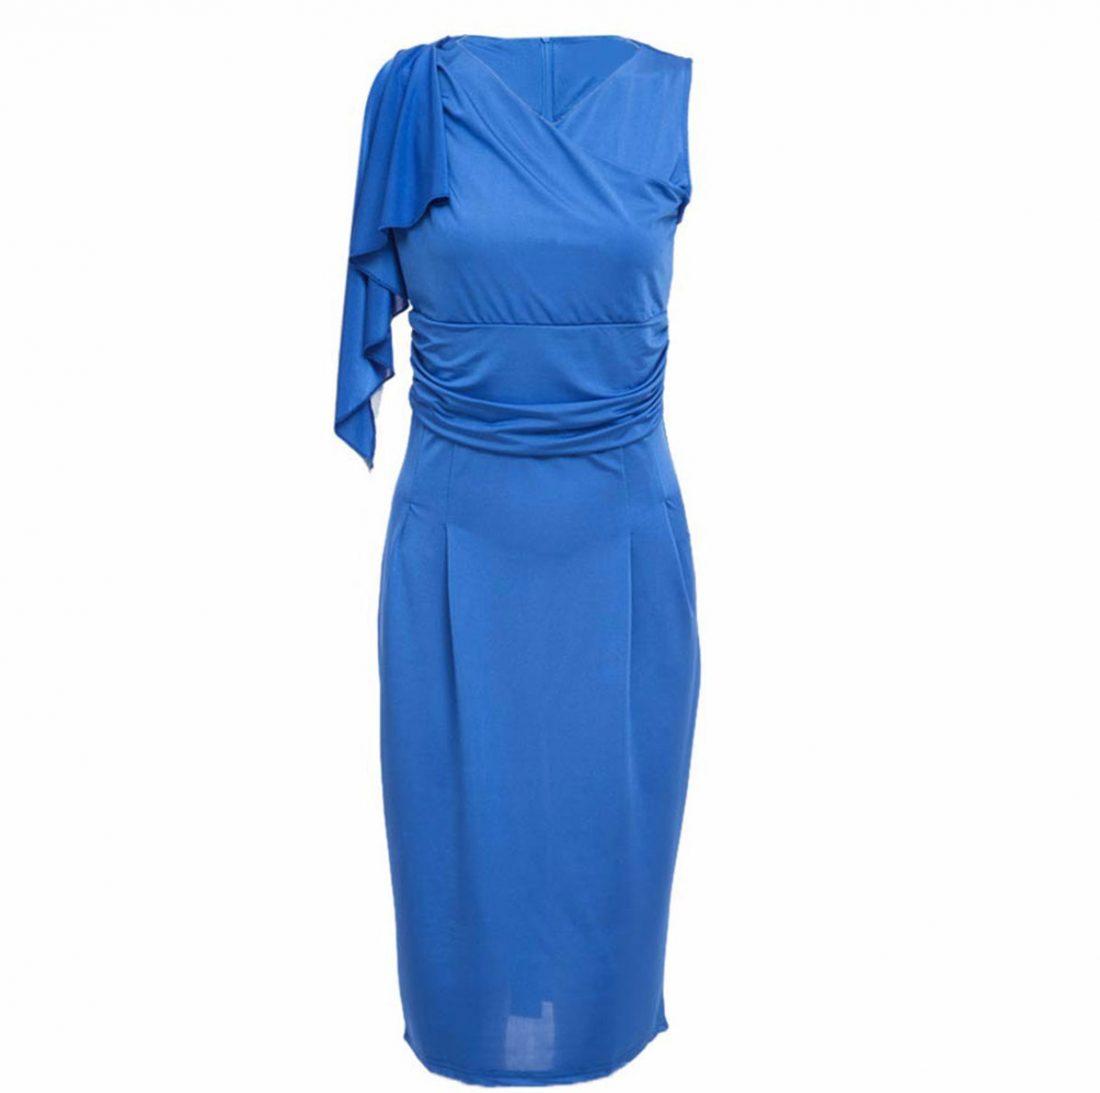 M0188 blue2 Short Sleeve Dresses maureens.com boutique